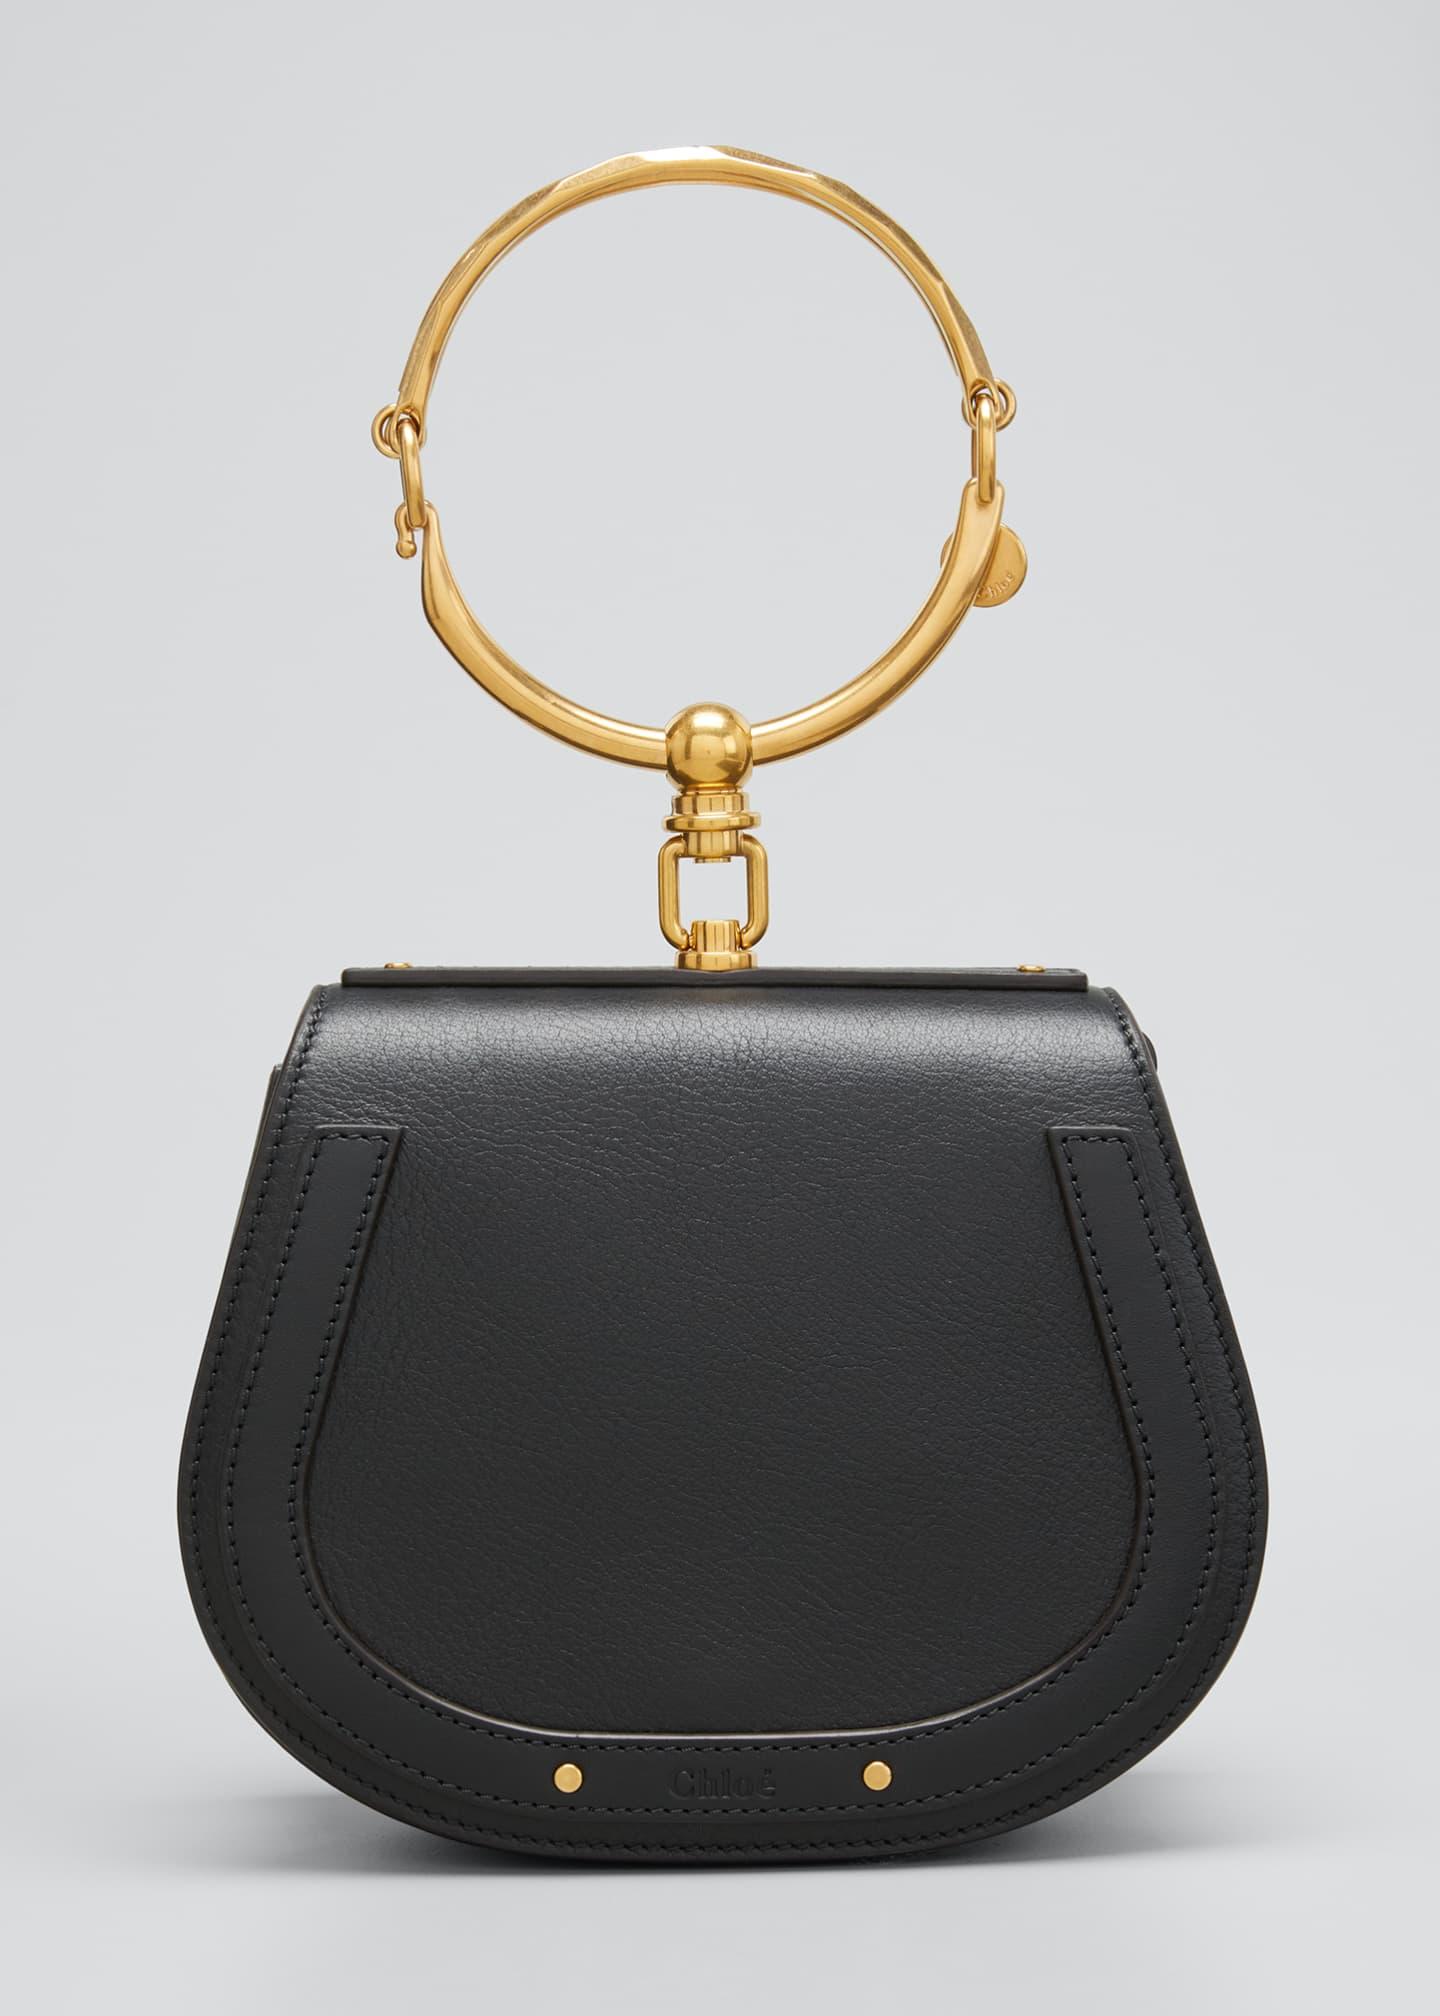 Chloe Nile Small Bracelet Crossbody Bag